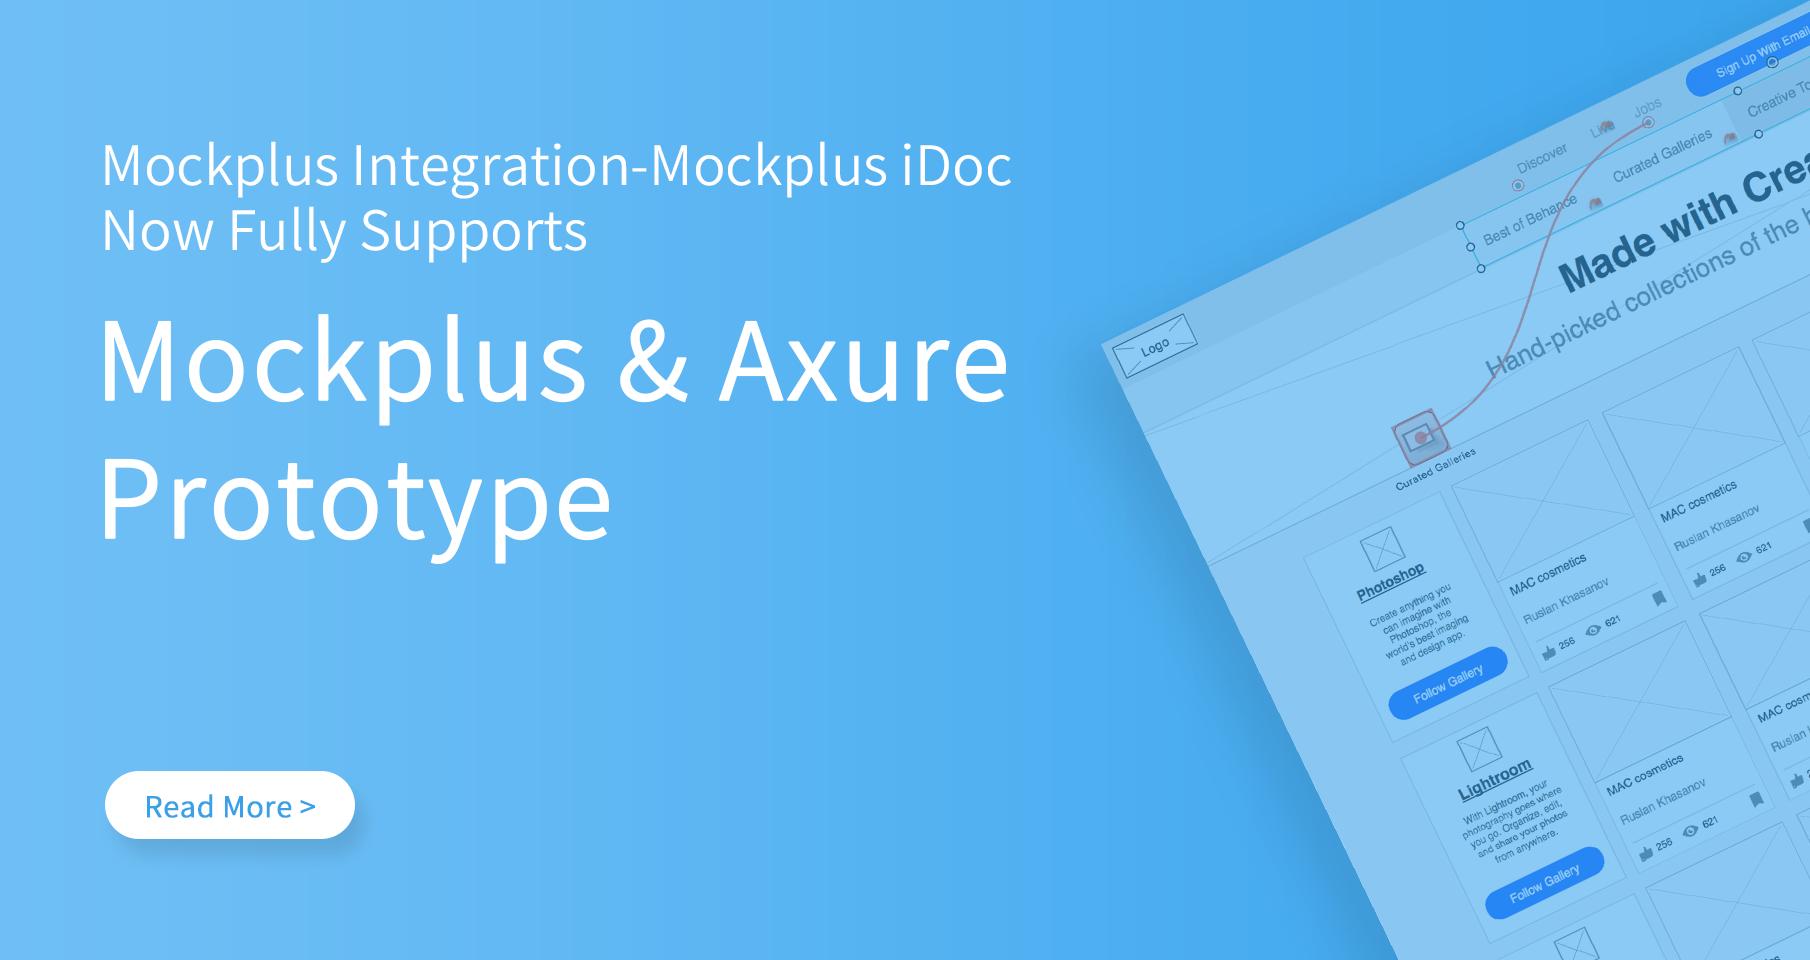 Mockplus Integration - Mockplus iDoc Now Fully Supports Mockplus & Axure Prototypes